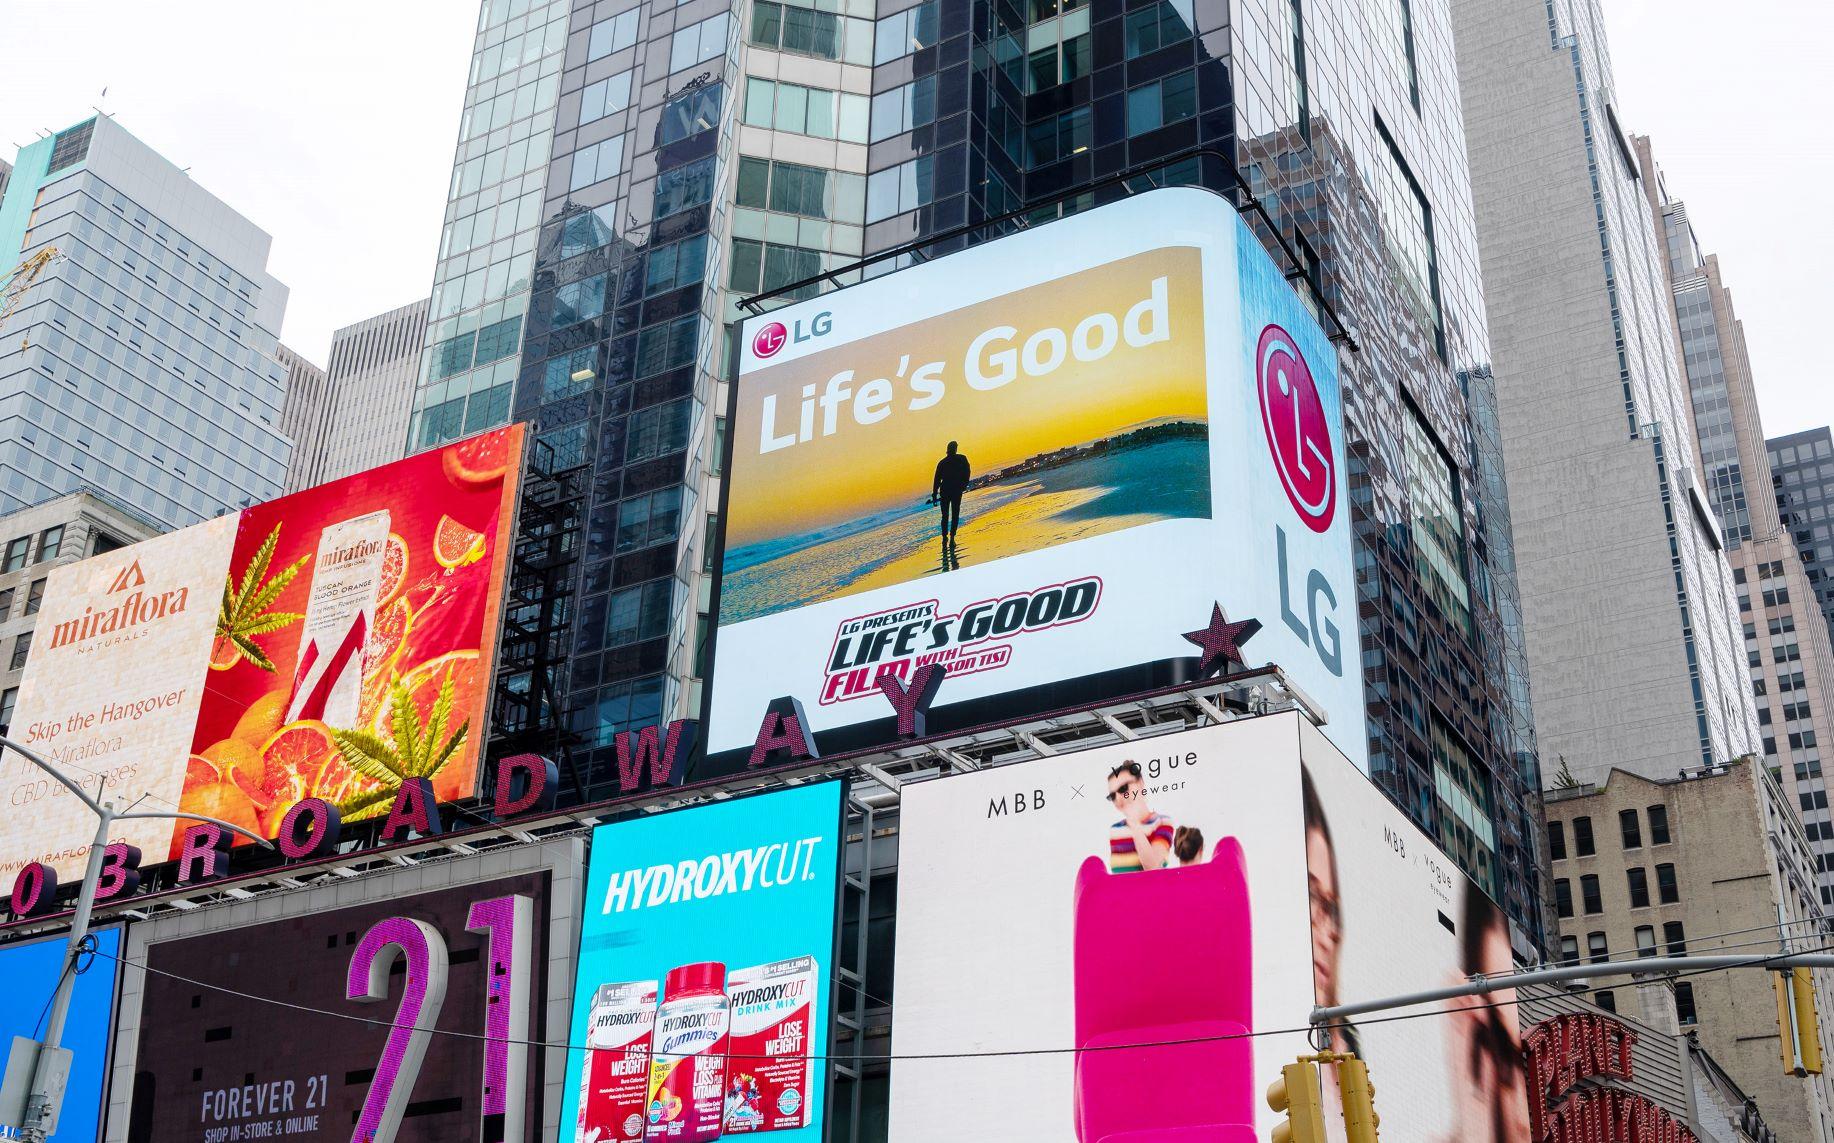 Lifes Good Film New York City Times Square